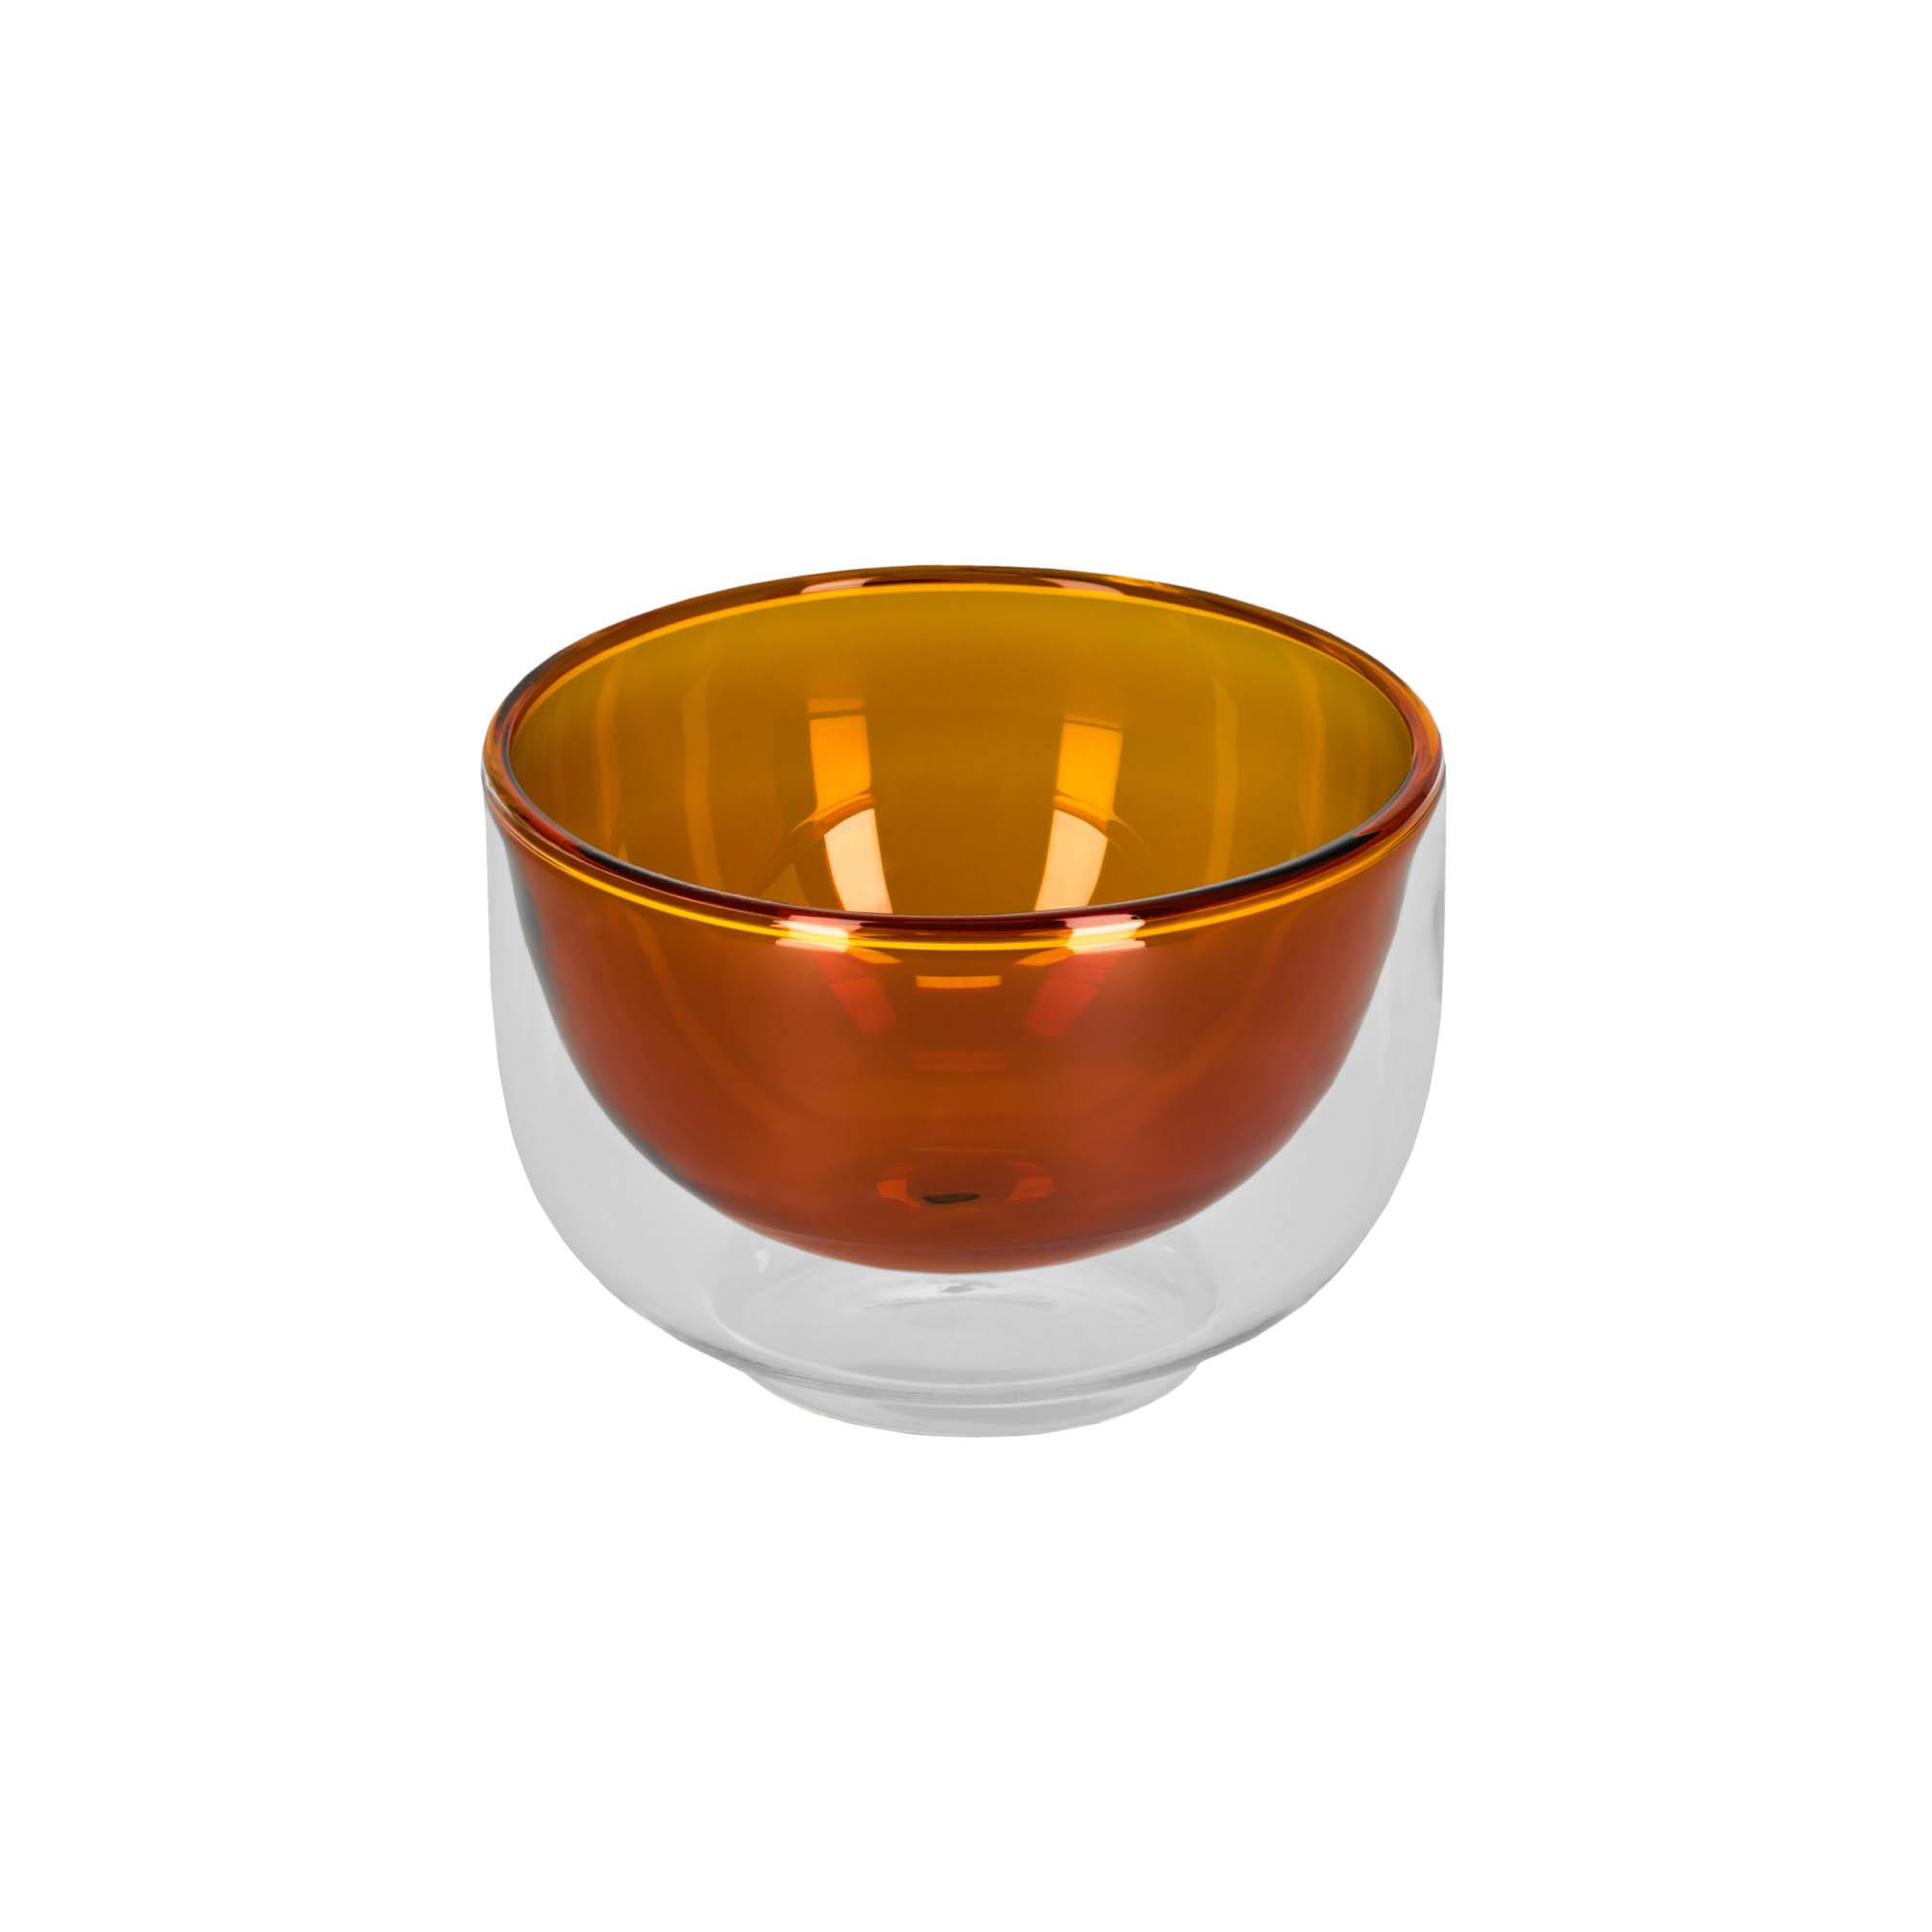 Kave home - bol braulia orange